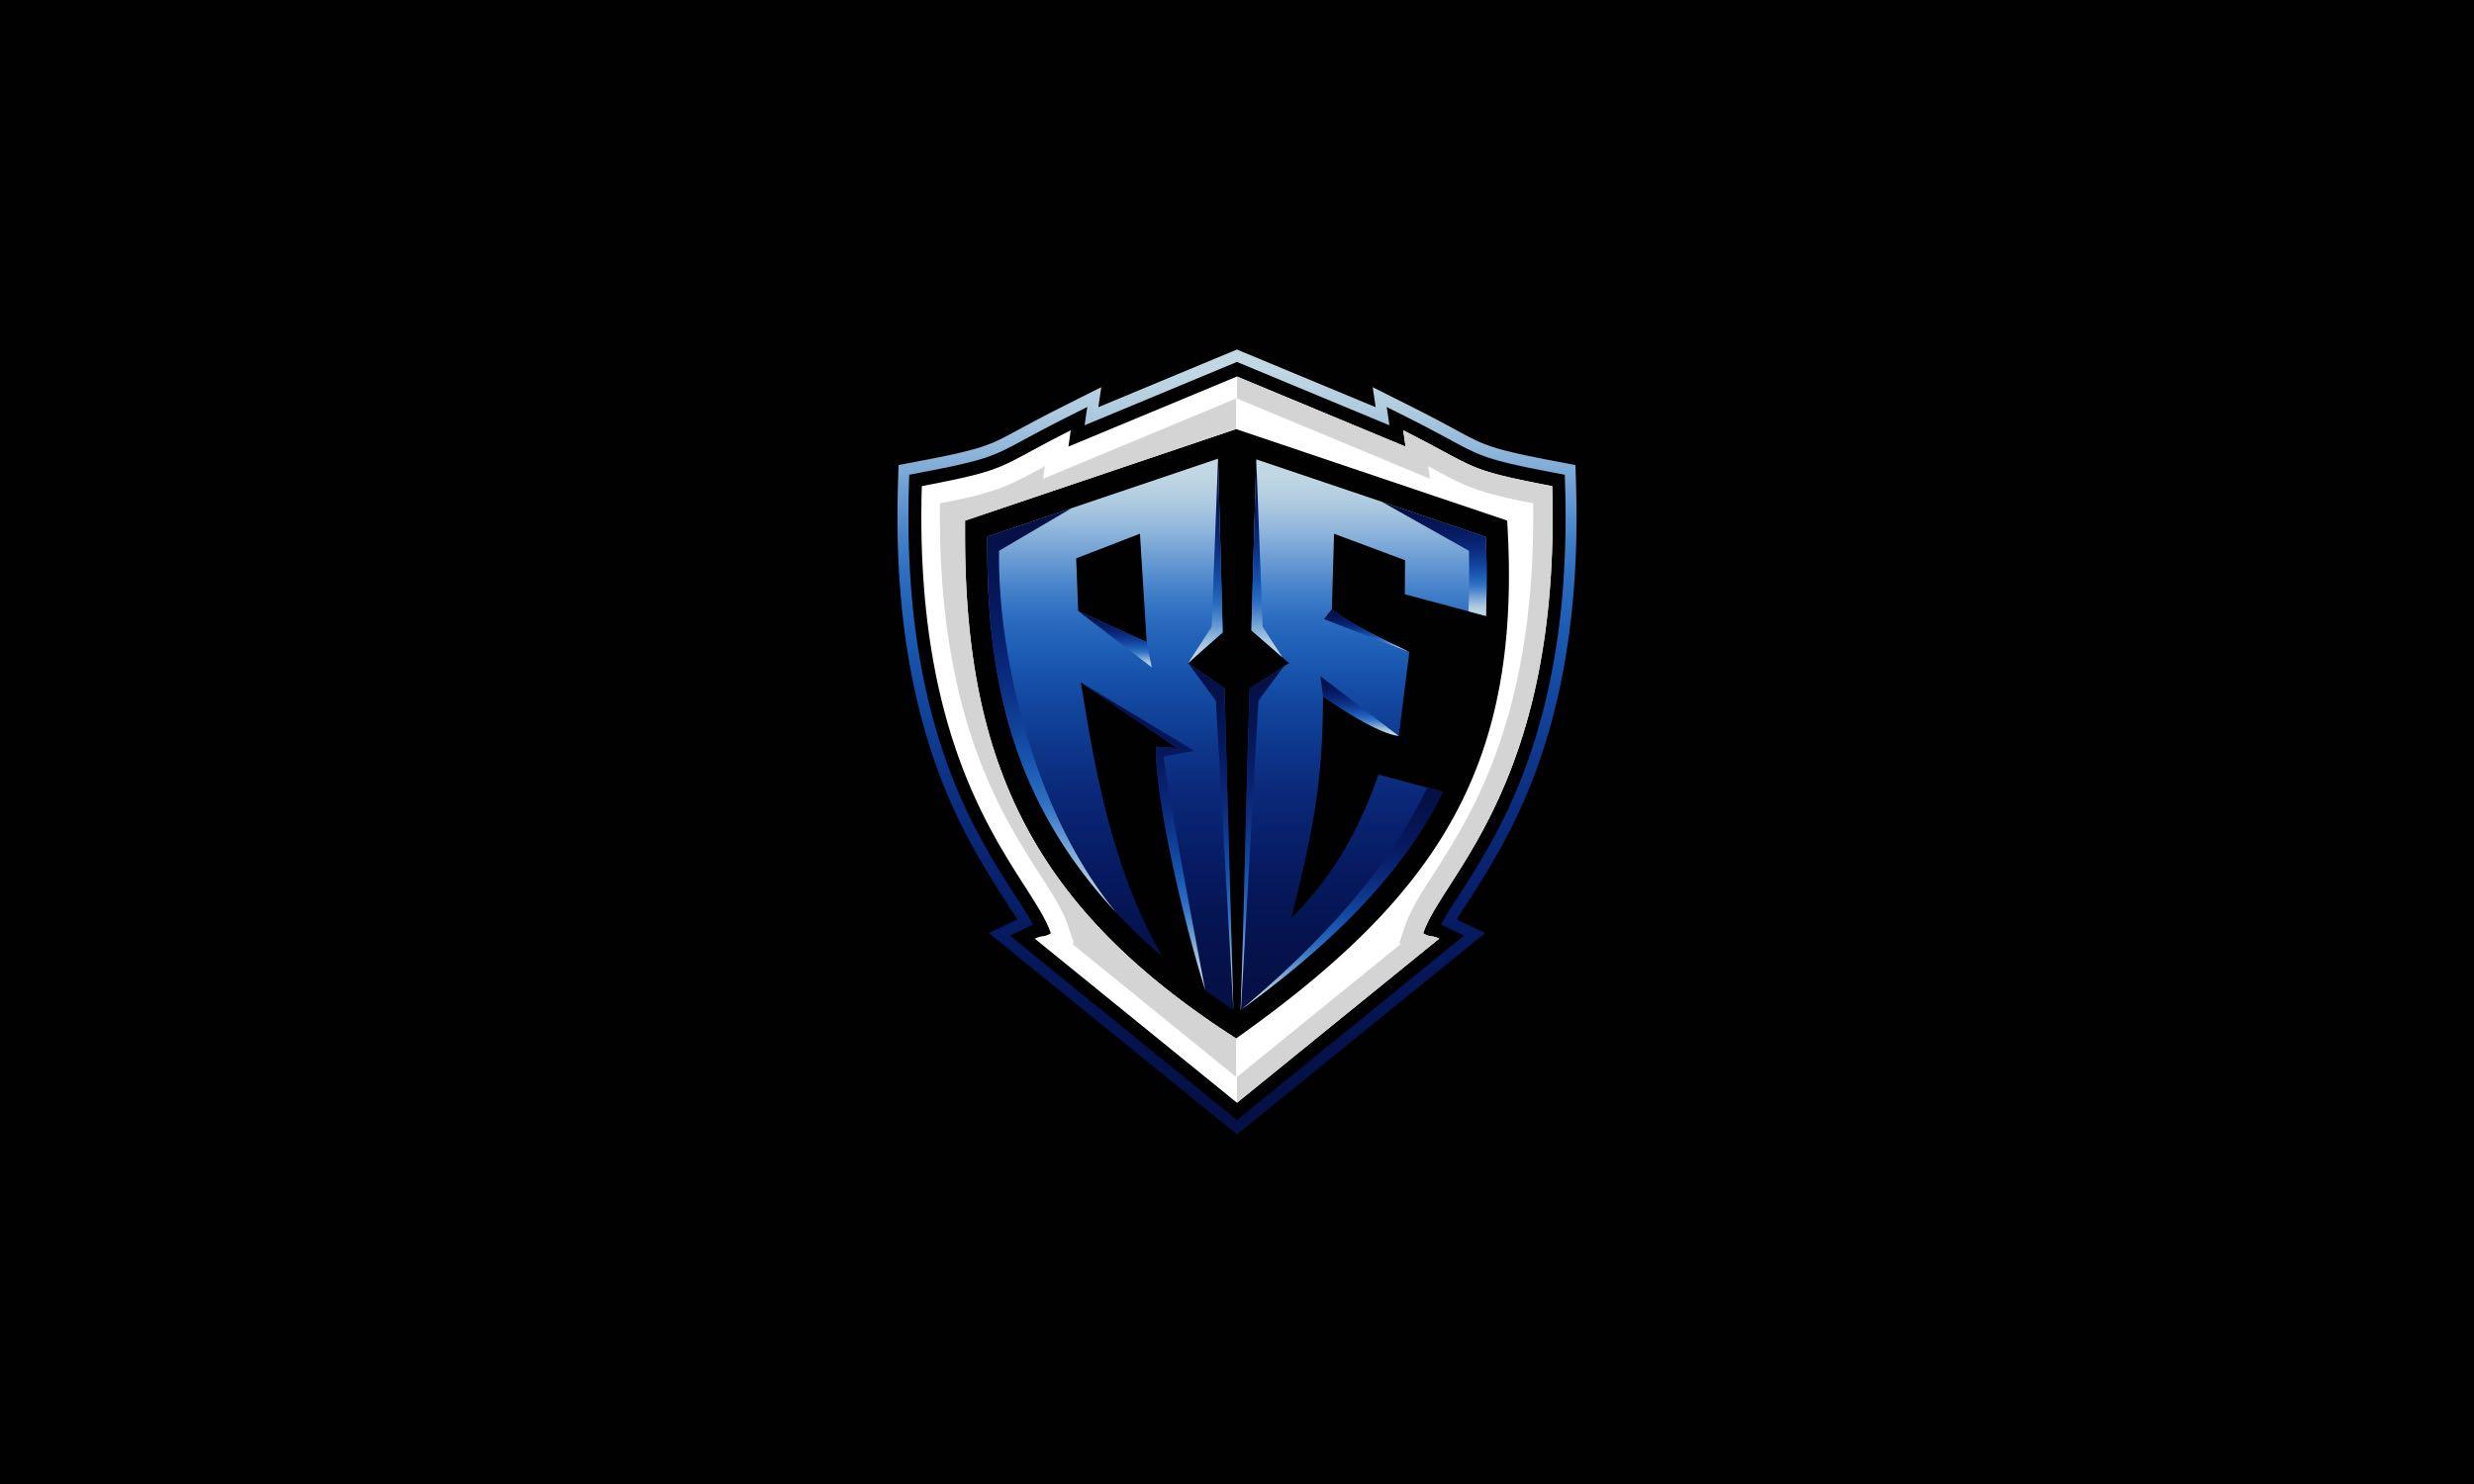 Realism Esports's logo